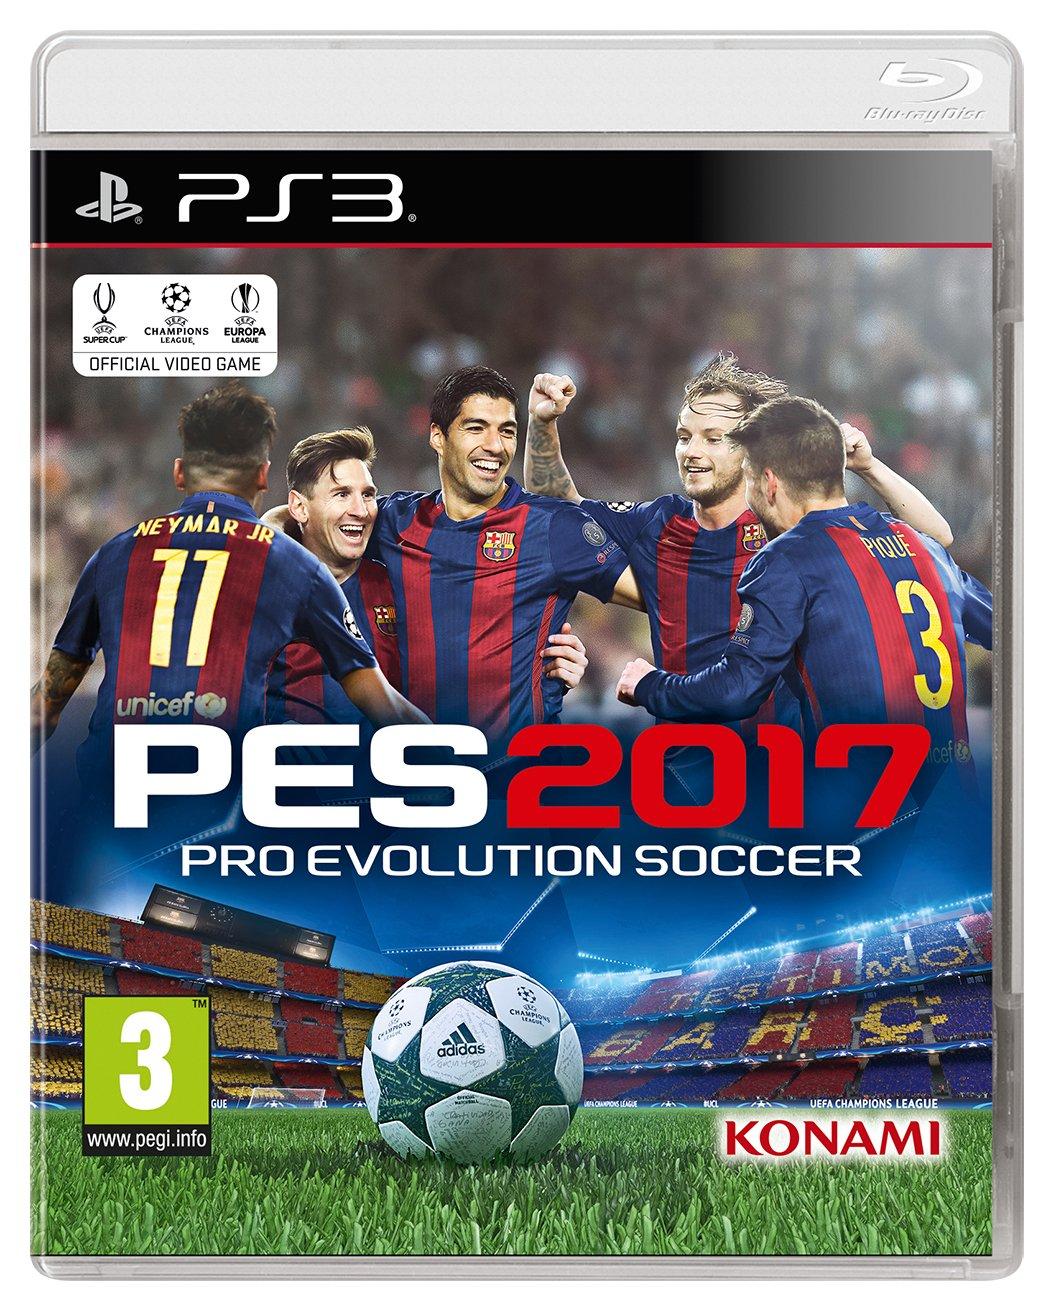 Konami Pro Evolution Soccer 2017 PS3 Game.